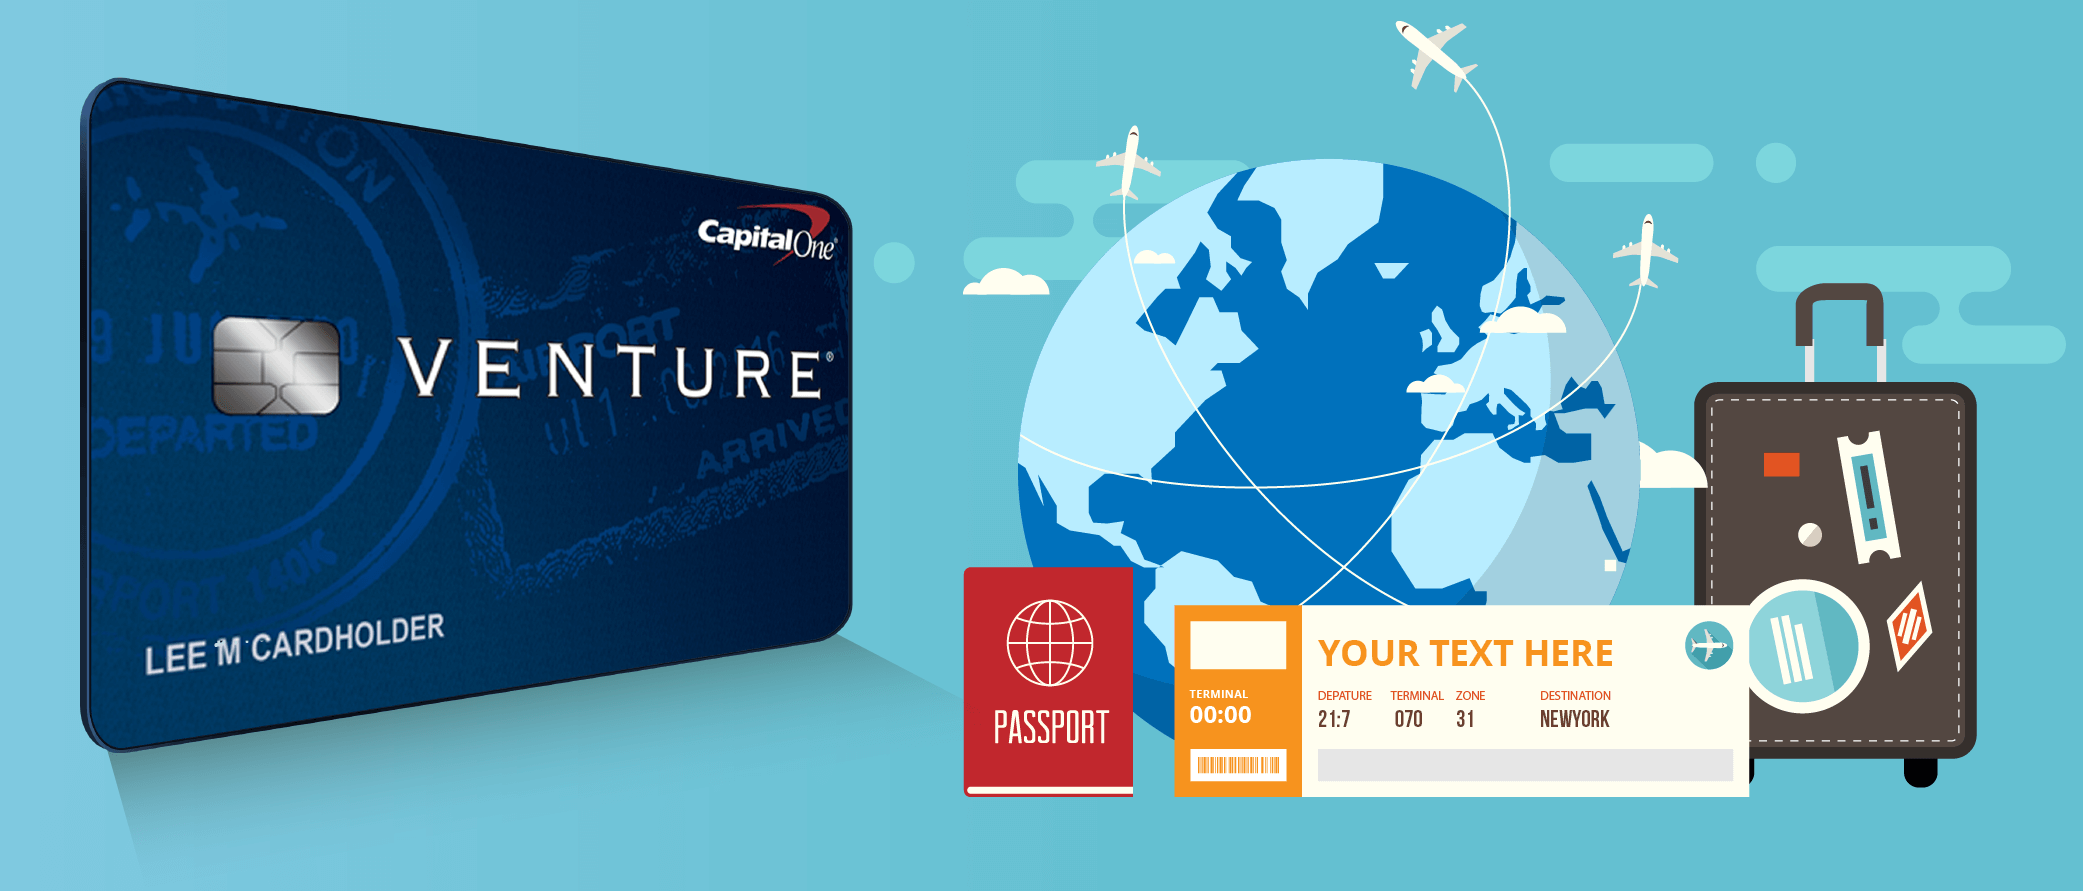 Reviewed: Capital One Venture Card - CreditLoan.com®